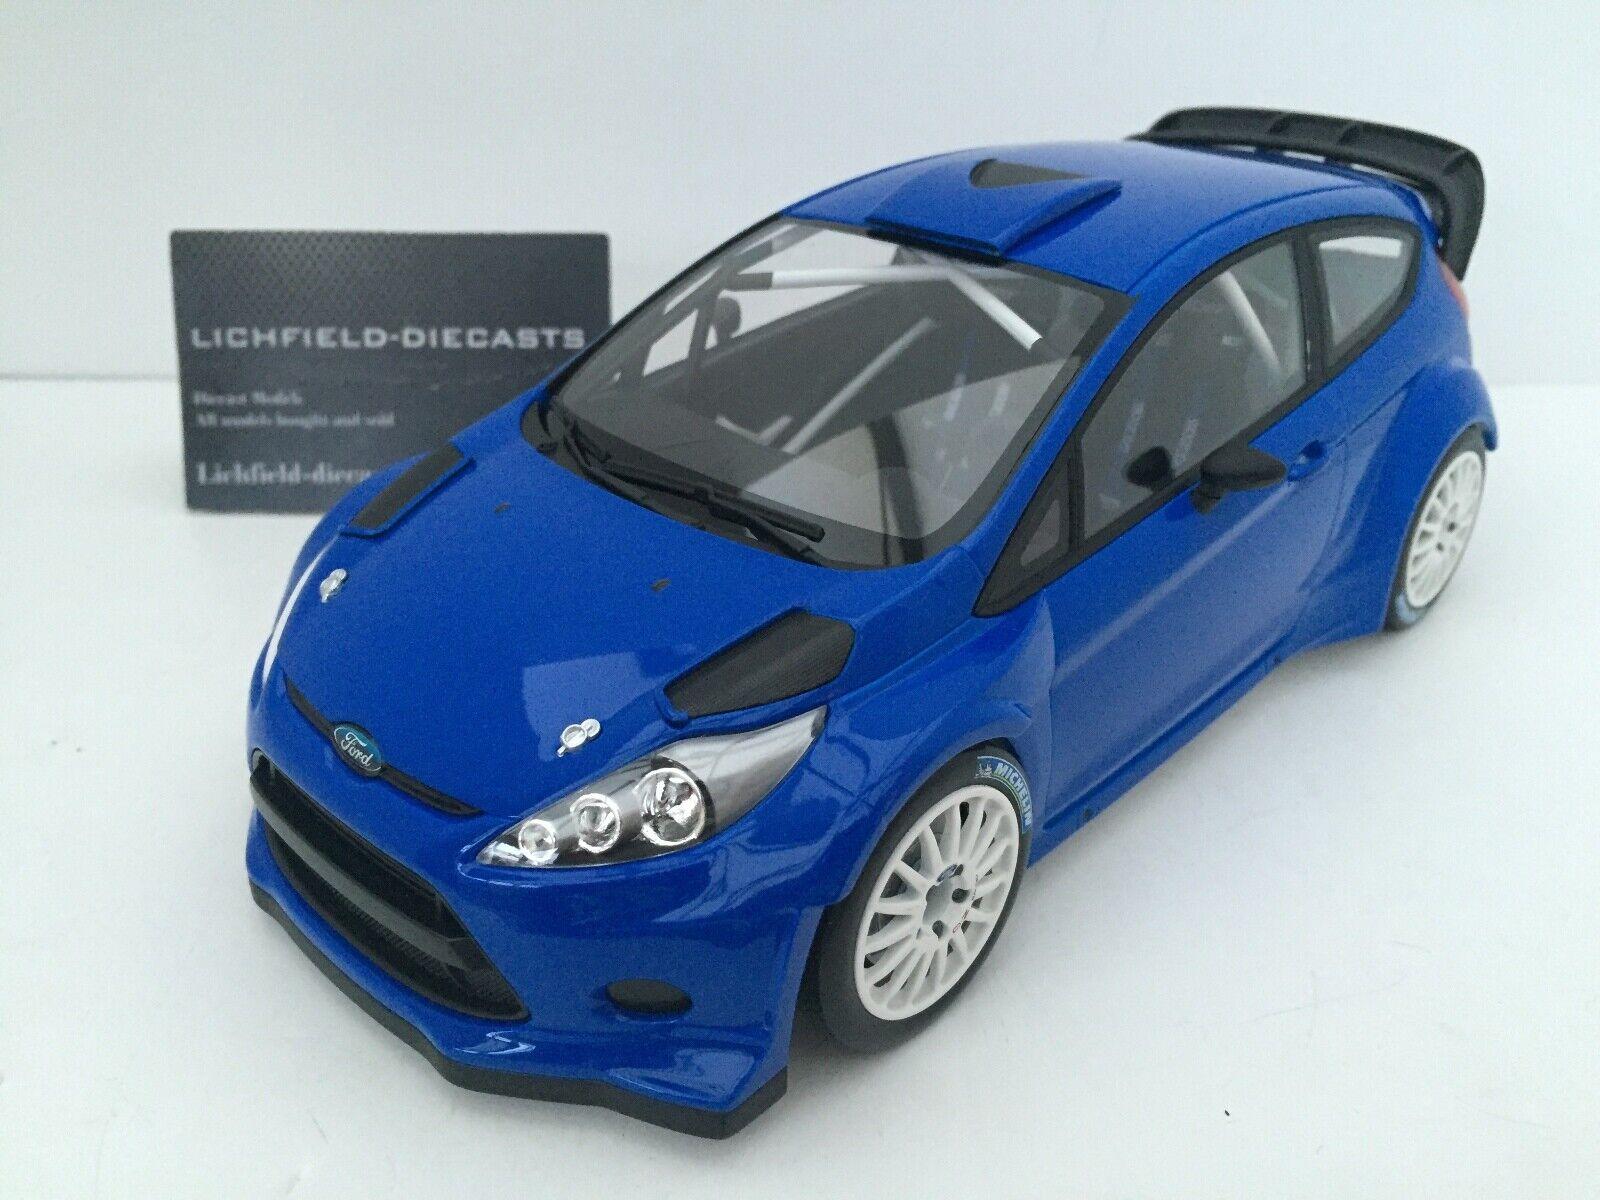 Minichamps 1 18 Ford Fiesta RS WRC  Street  bluee LTD 1002 PCS 151 110891 V.RARE